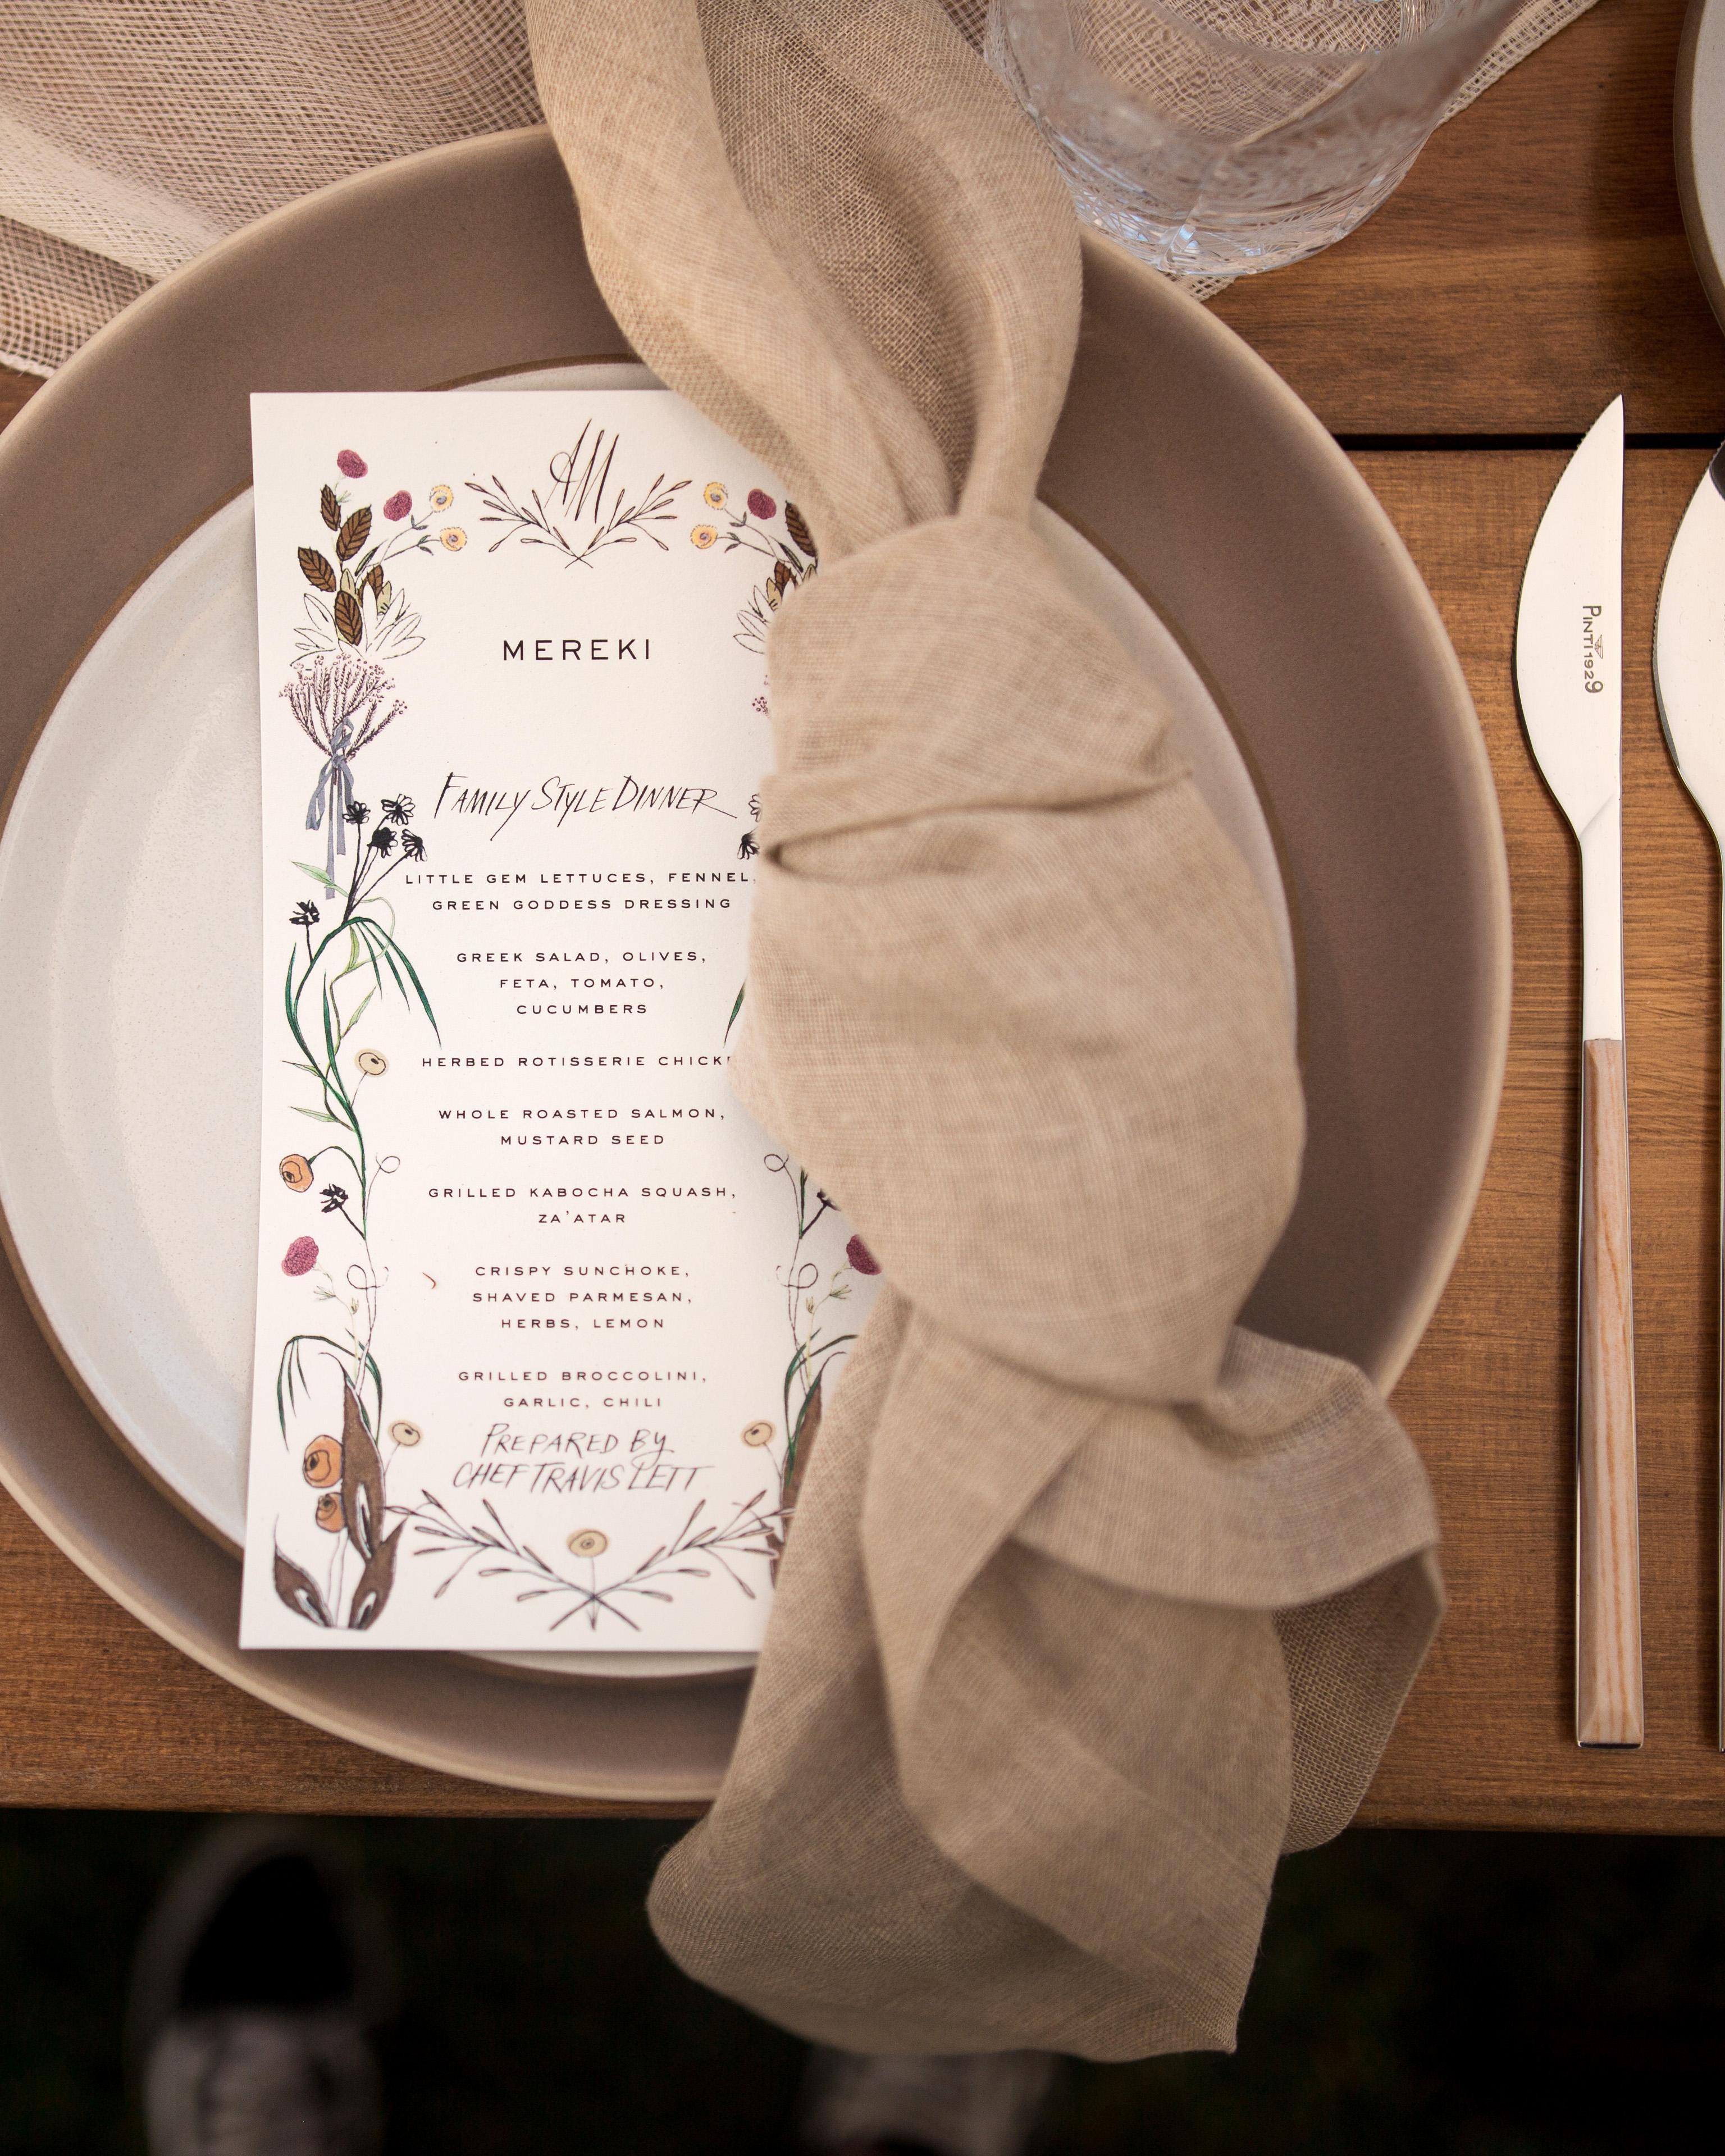 anika max wedding place setting with menu and napkin